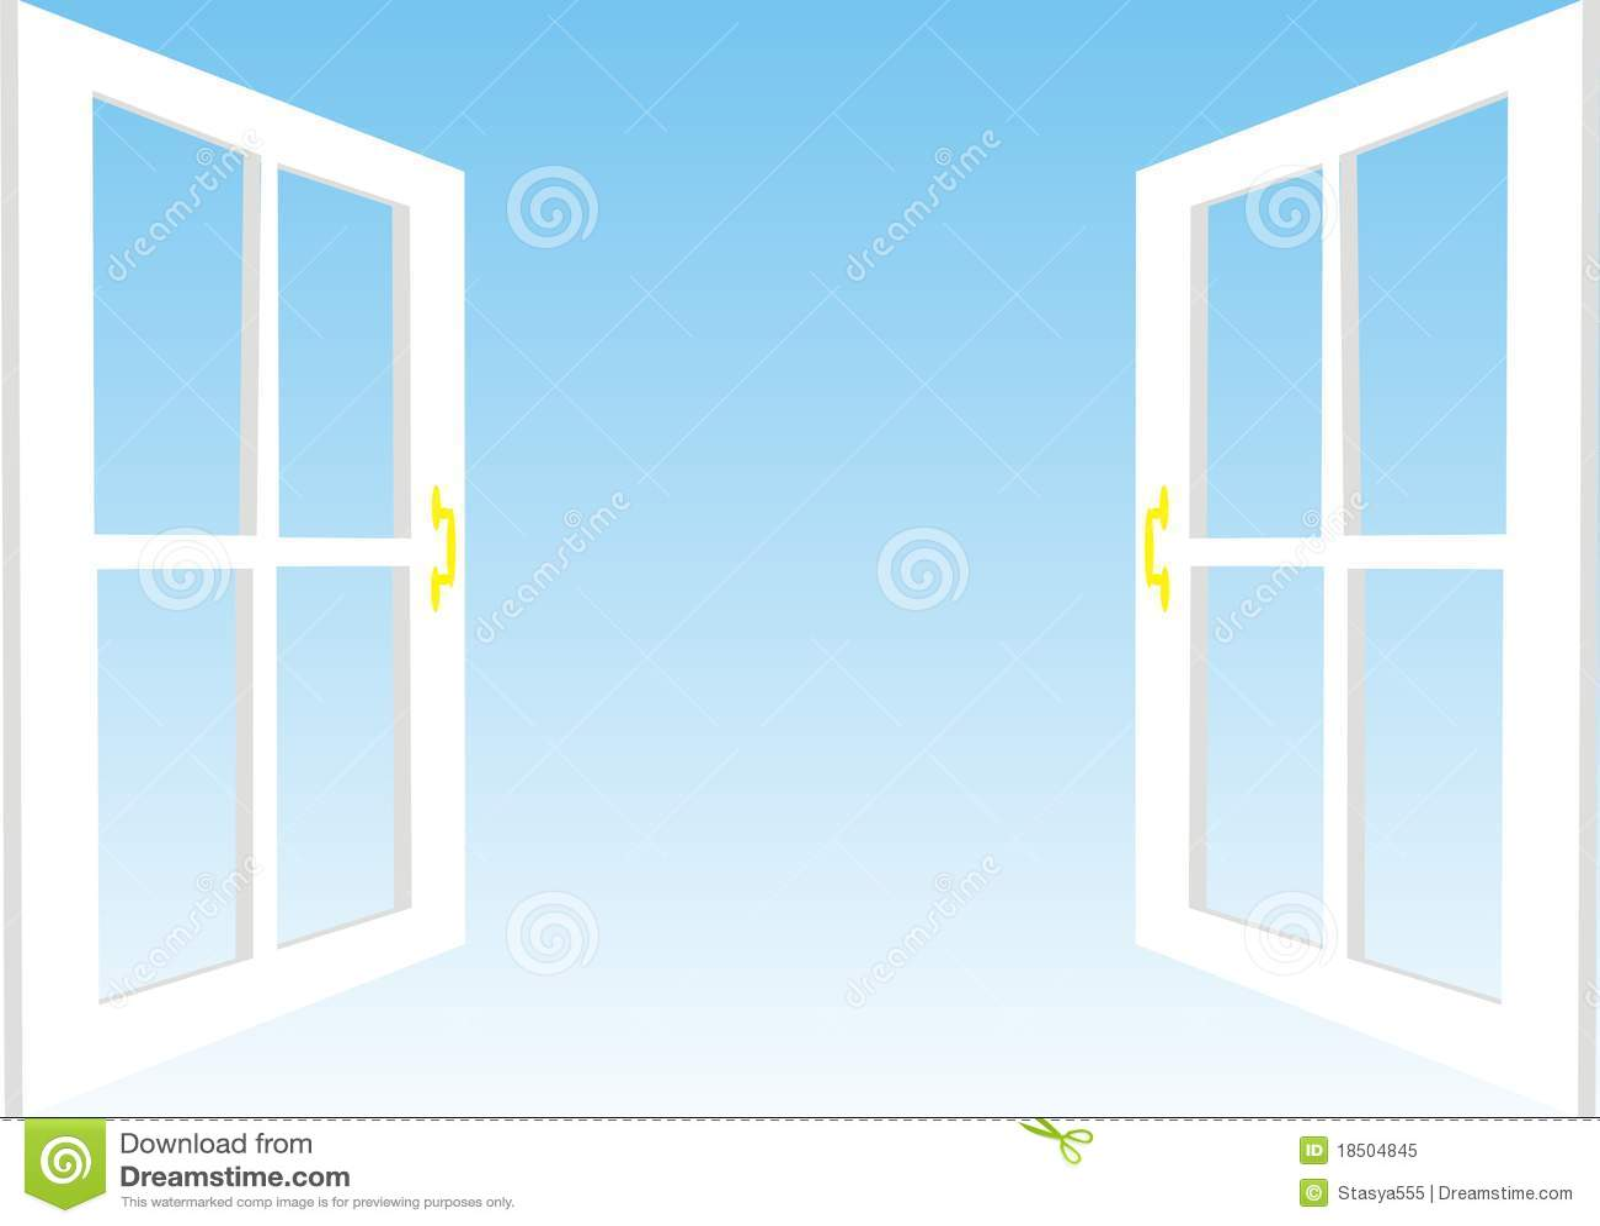 Open Window, Illustration Royalty Free Stock Photo - Image: 18504845